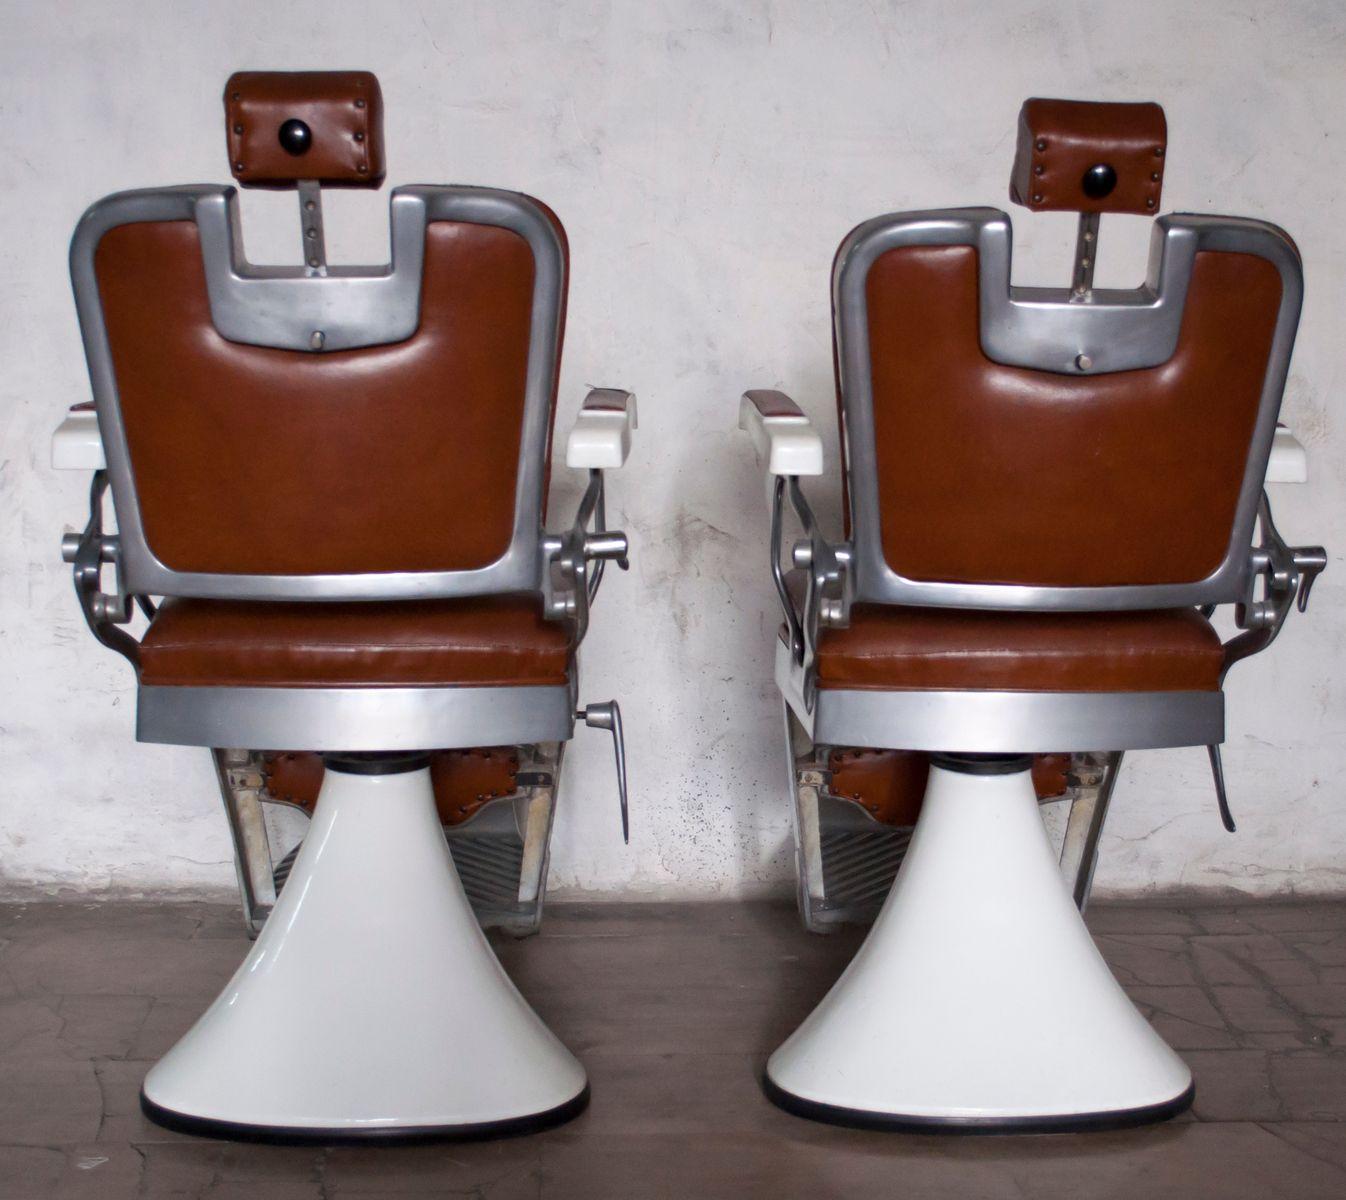 barber chairs for sale australia garden view landscape